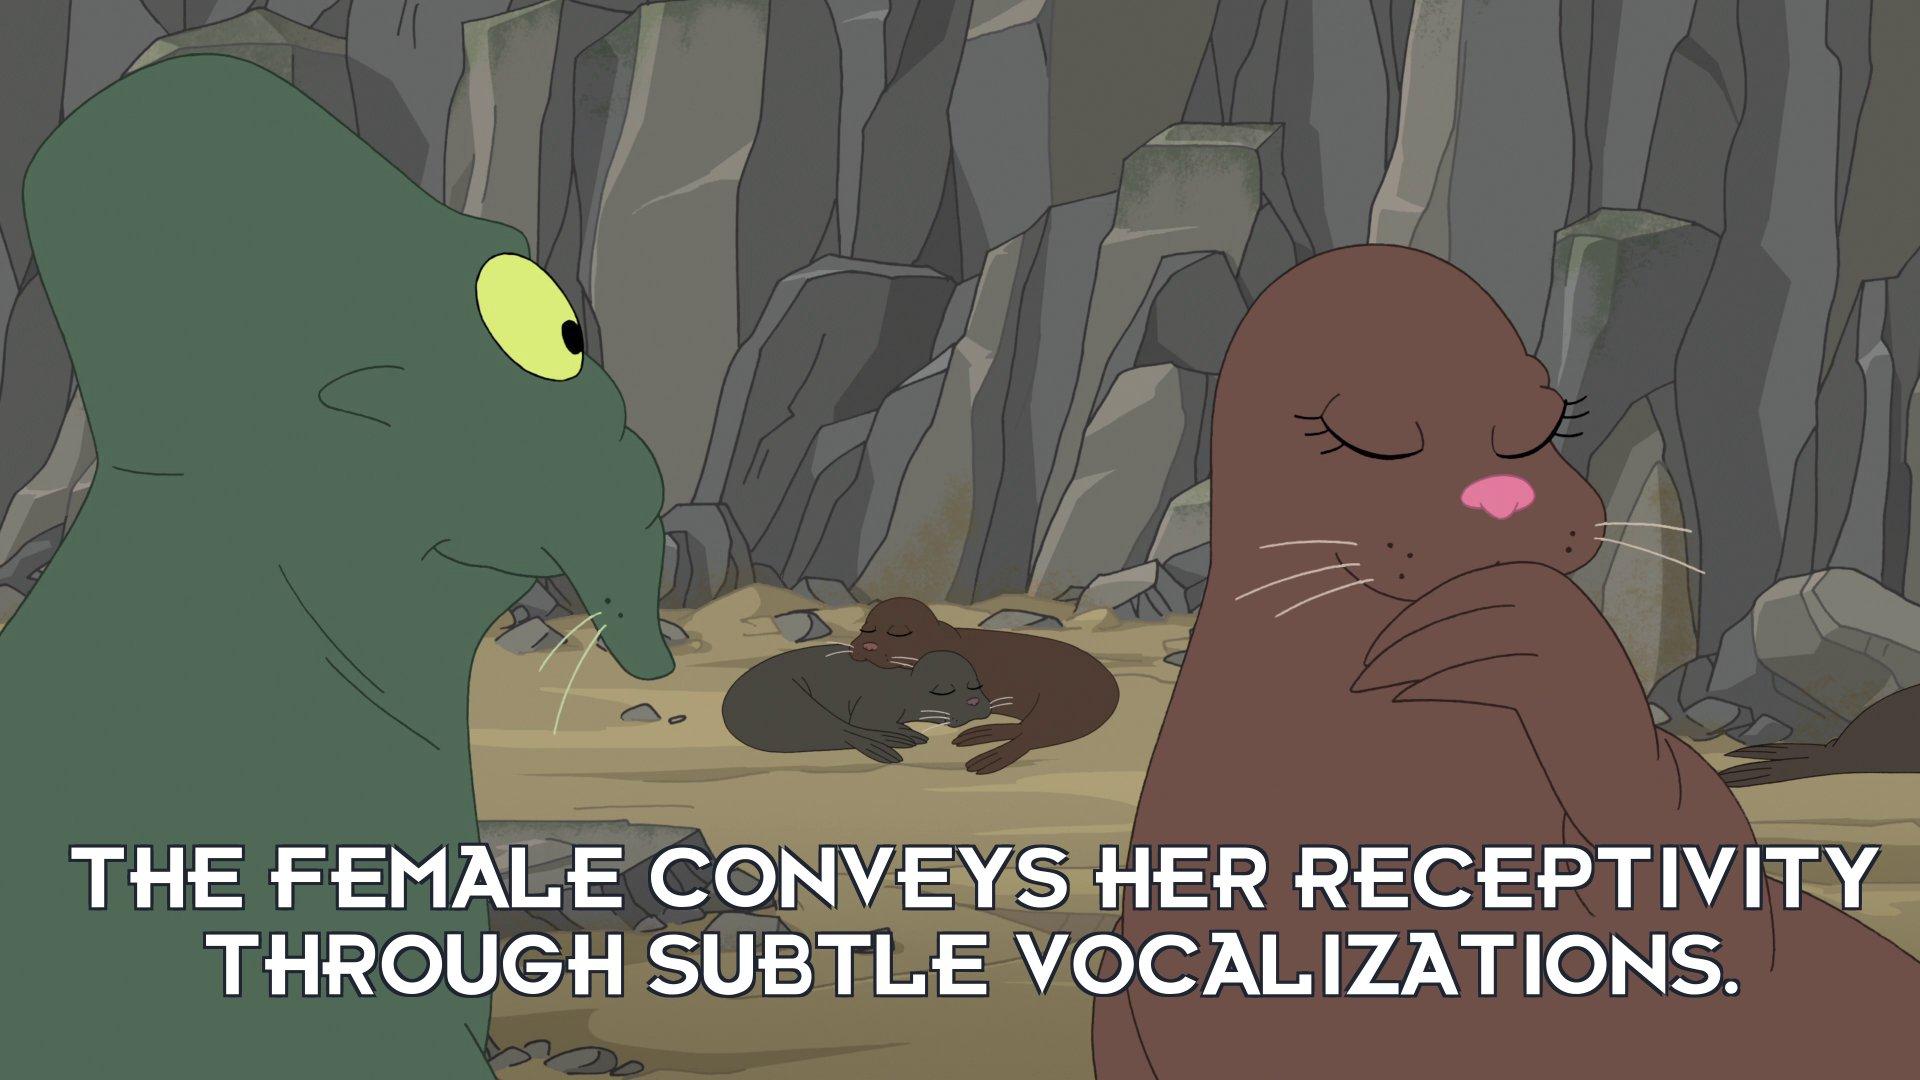 Narrator: The female conveys her receptivity through subtle vocalizations.